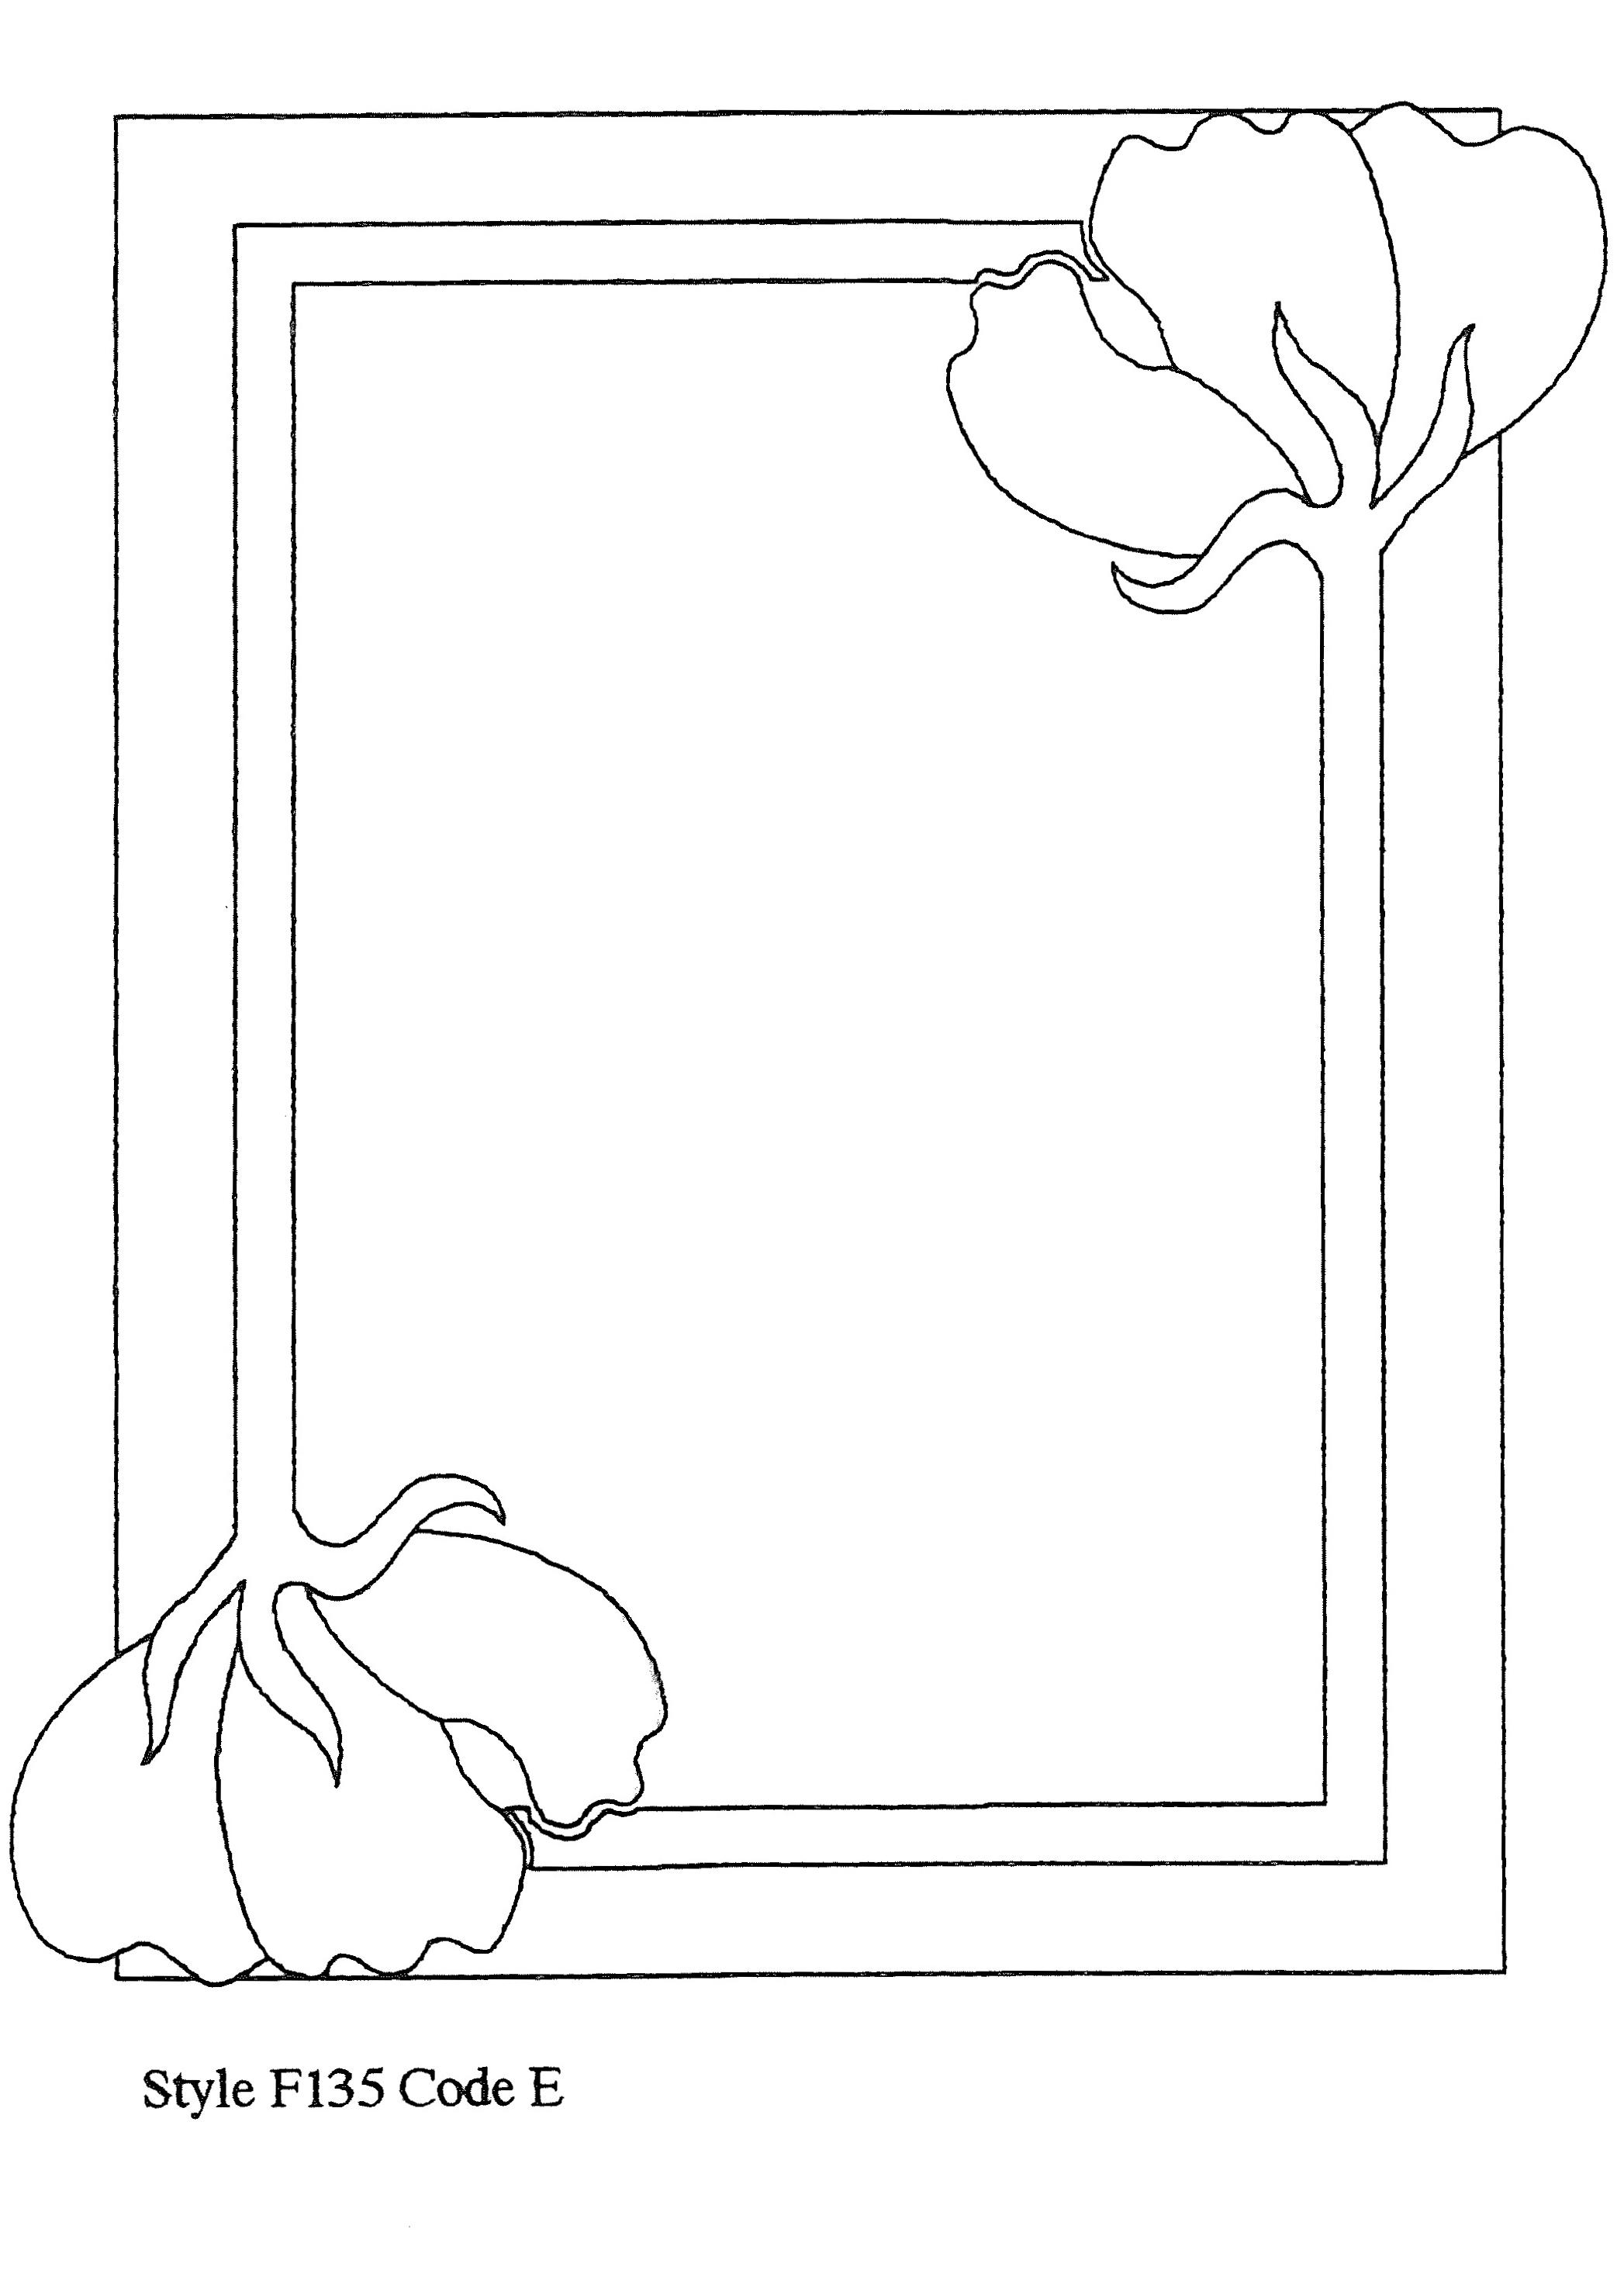 Page 4 copy 2.jpg